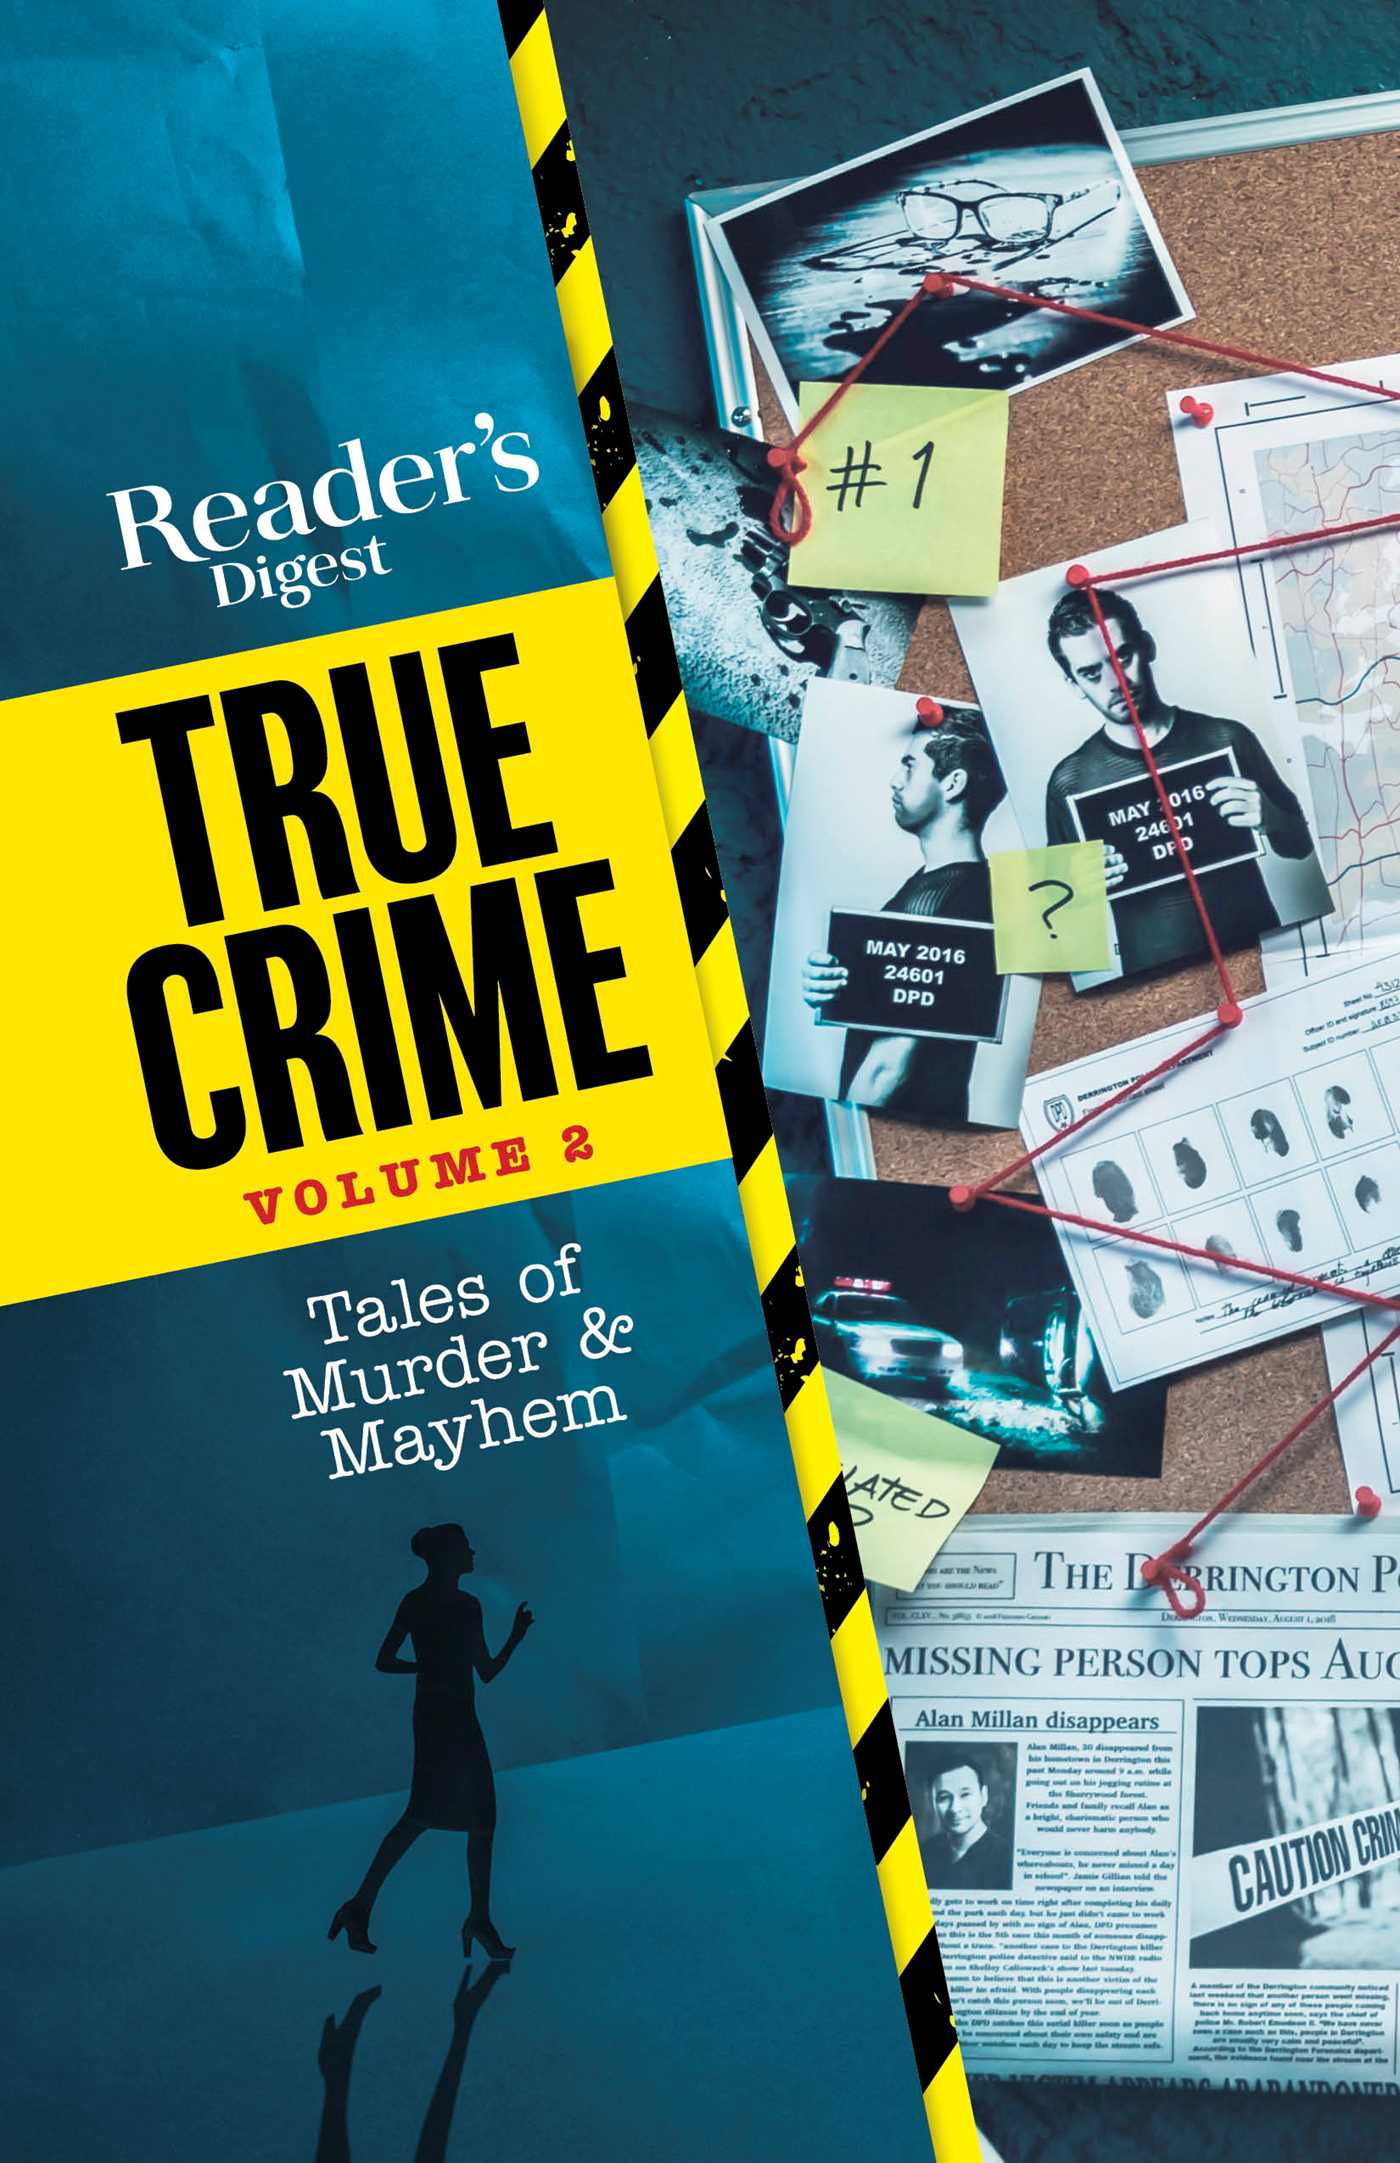 Reader's Digest True Crime vol 2: Tales of Murder Mayhem